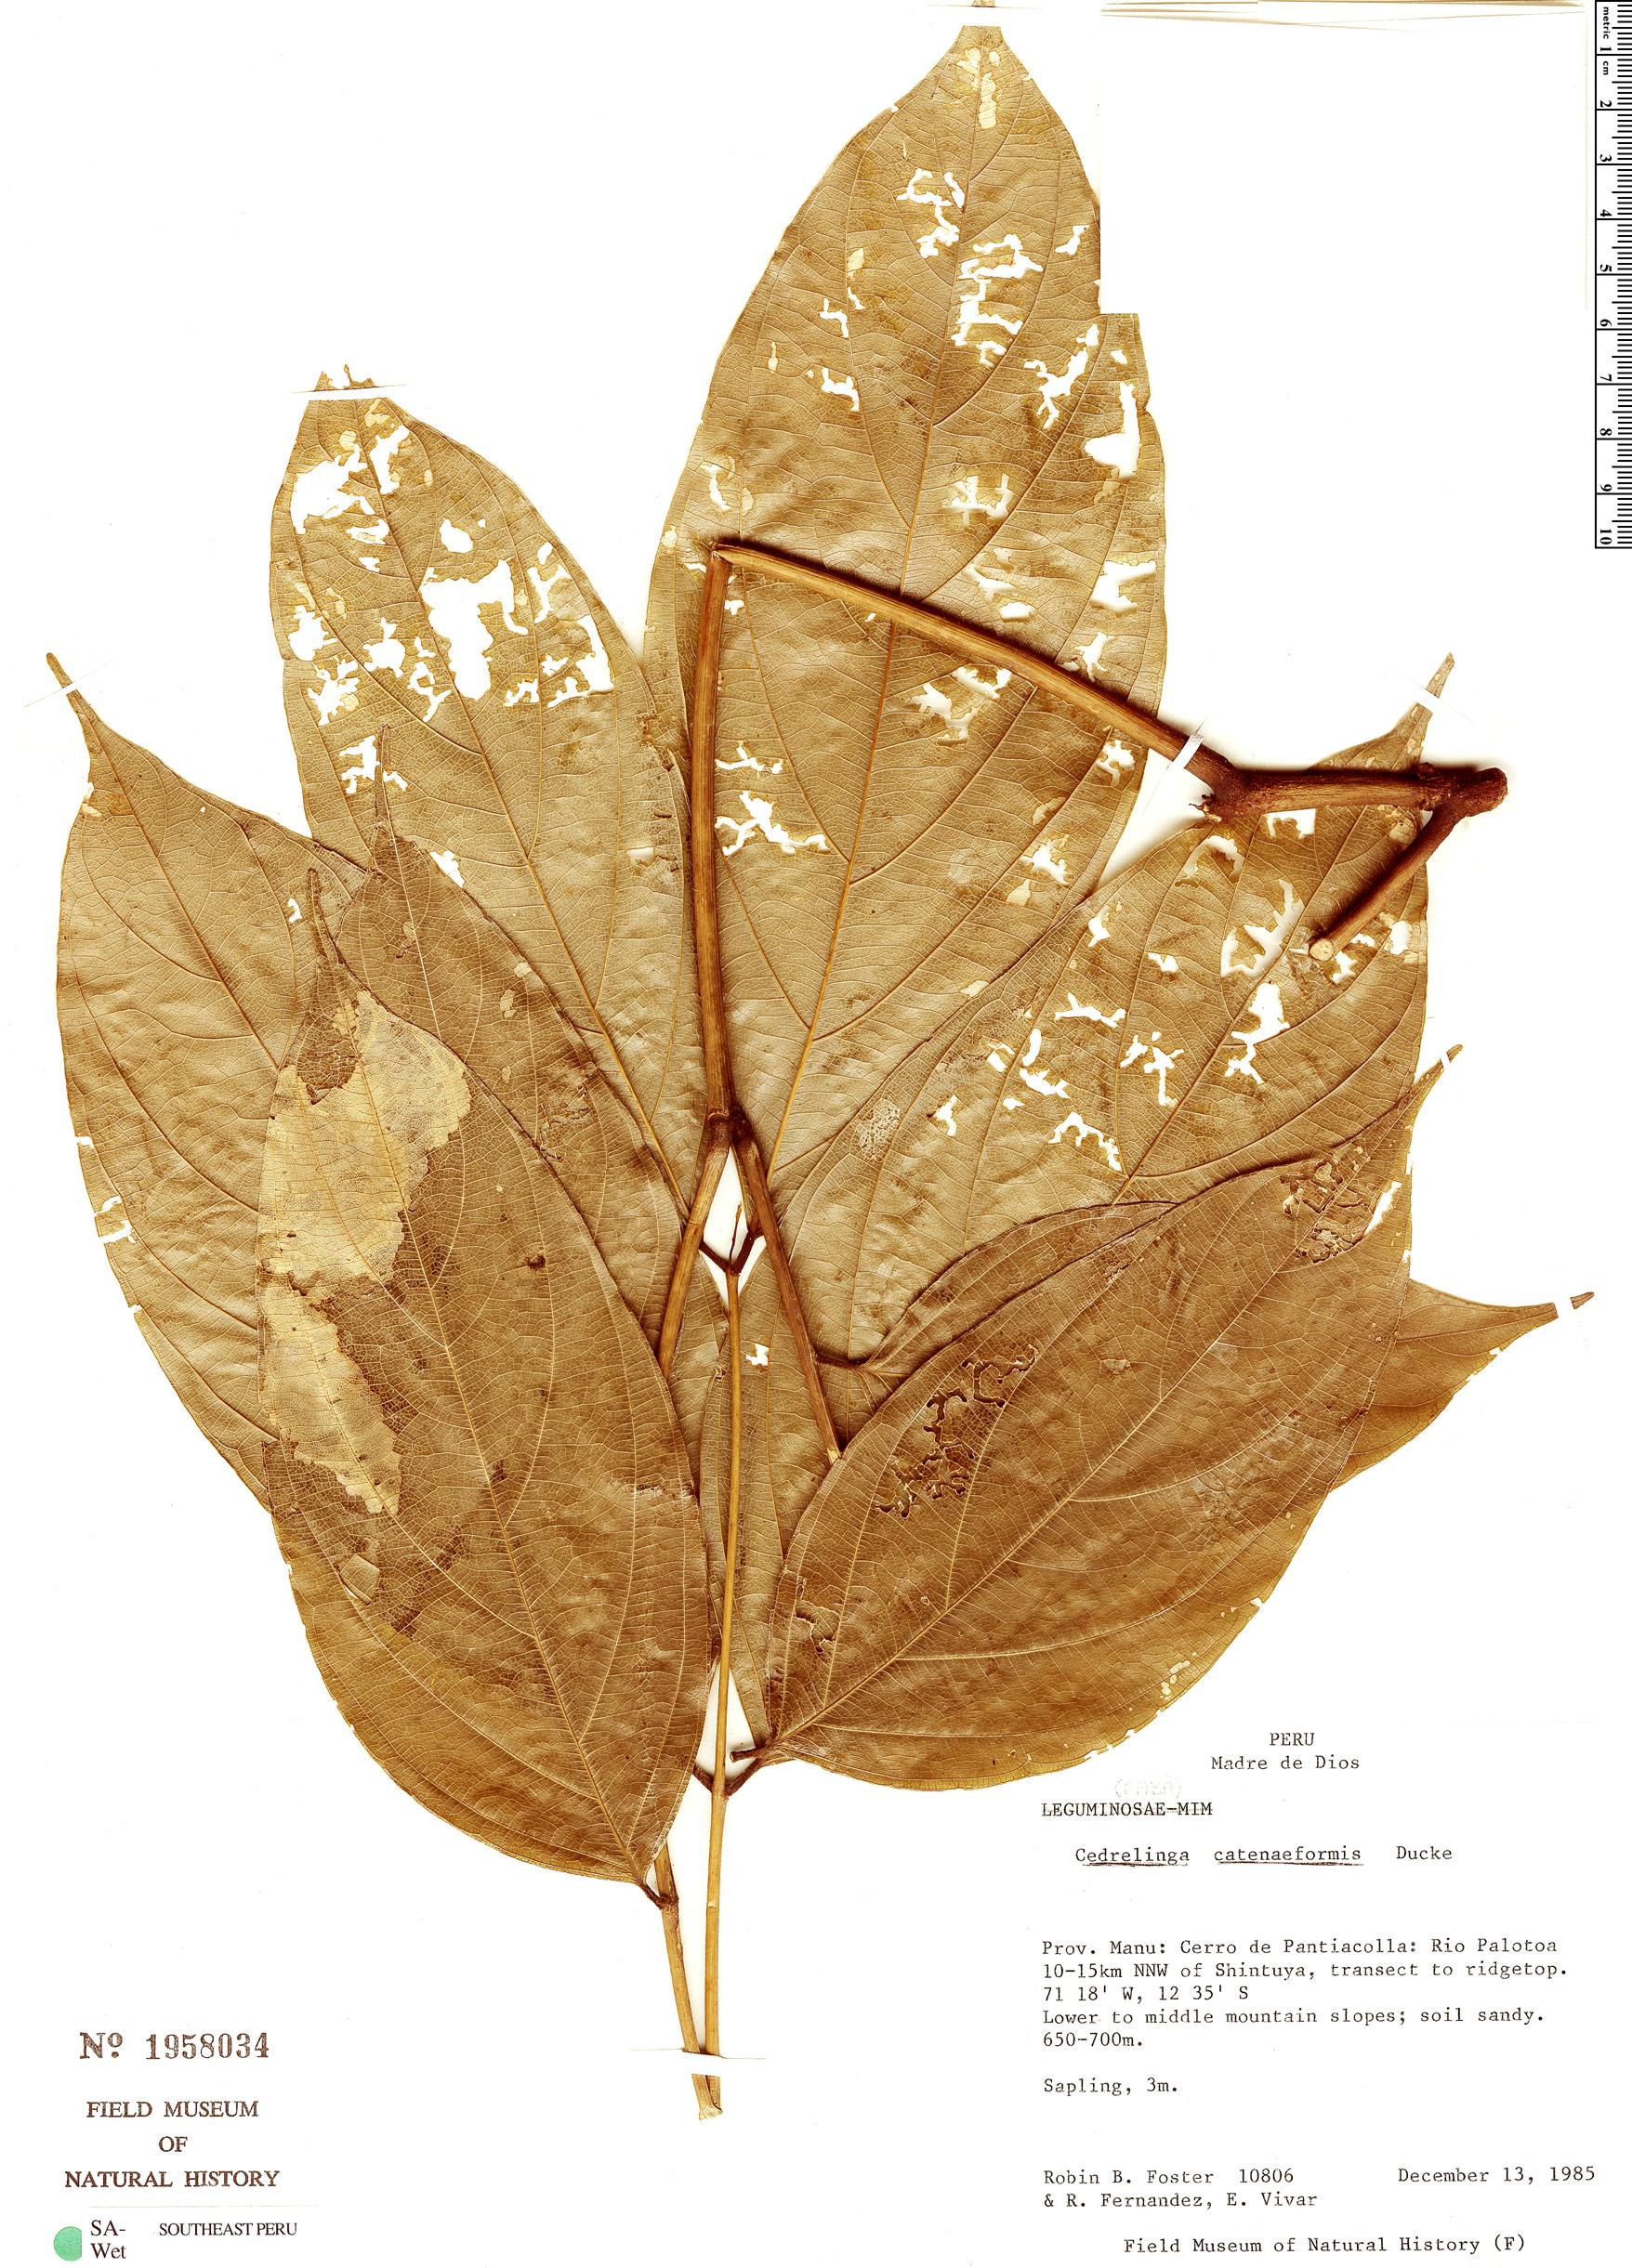 Specimen: Cedrelinga cateniformis